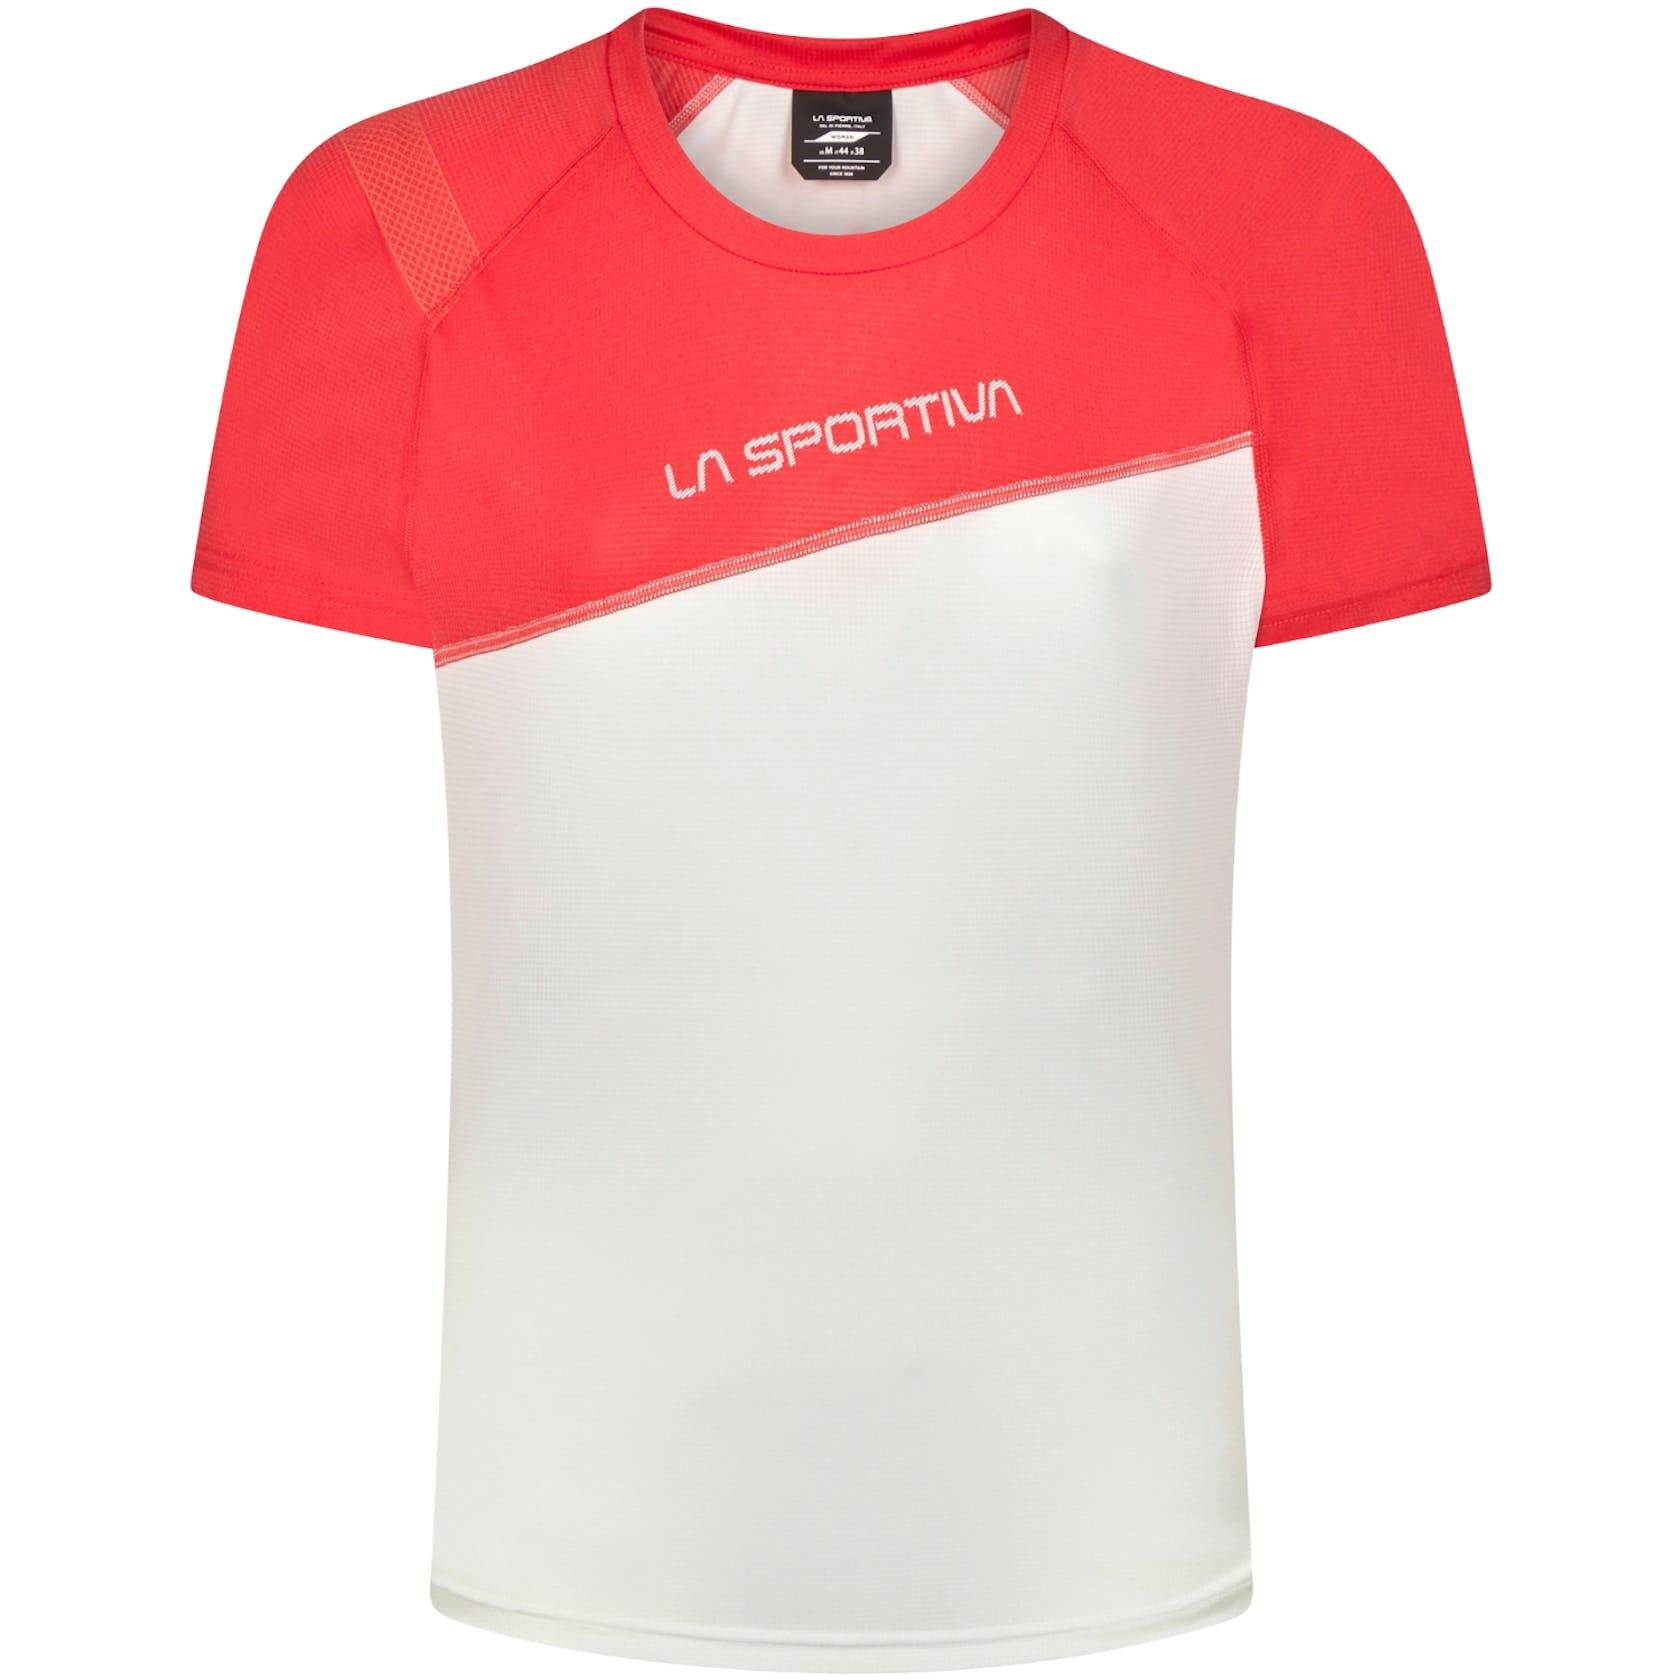 La Sportiva Catch - Trailrunning T-Shirt - Damen